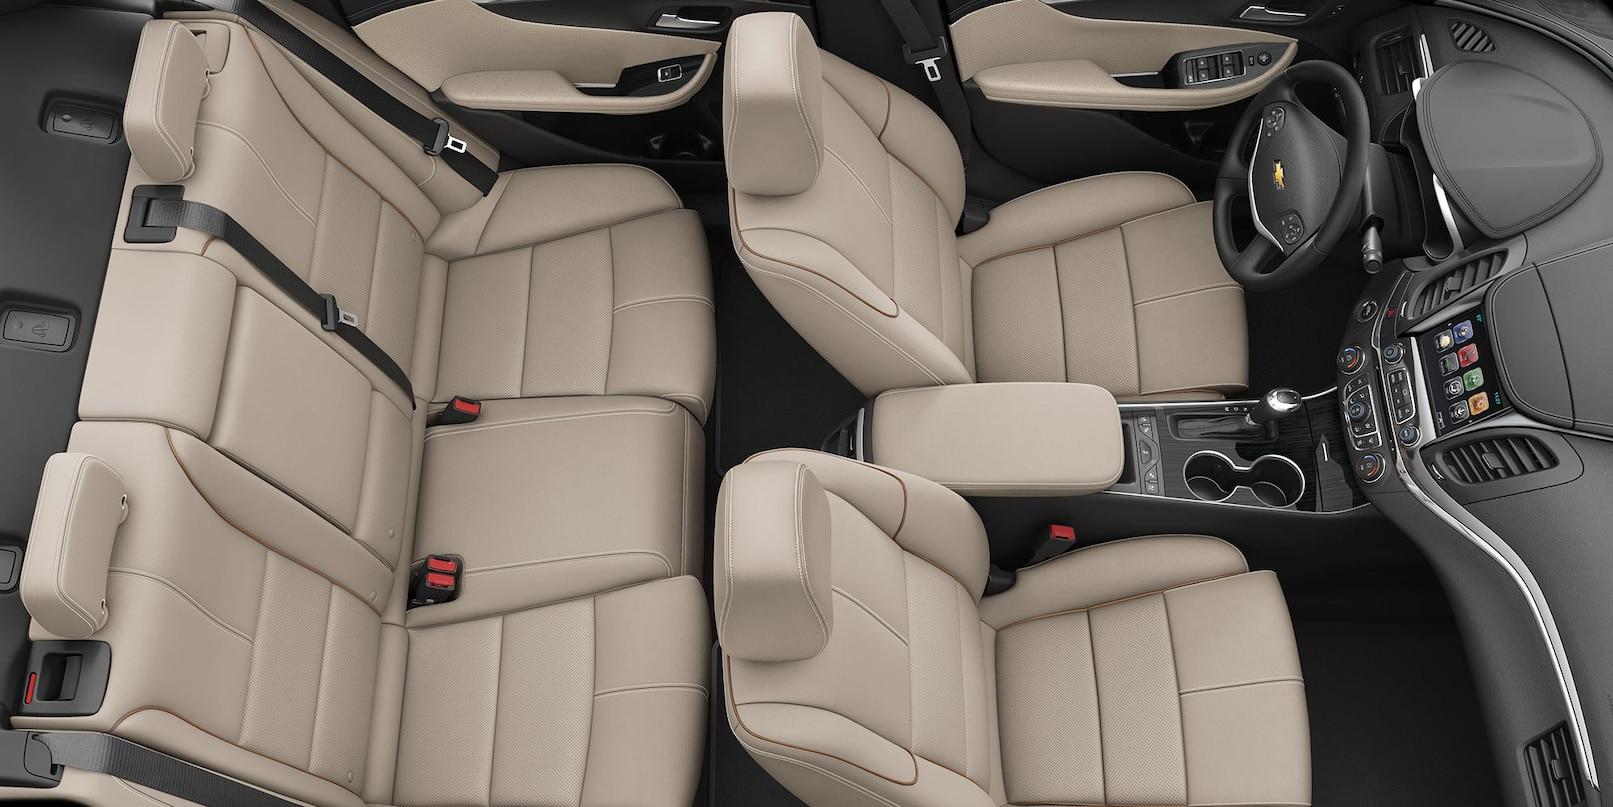 Interior of the 2019 Chevrolet Impala